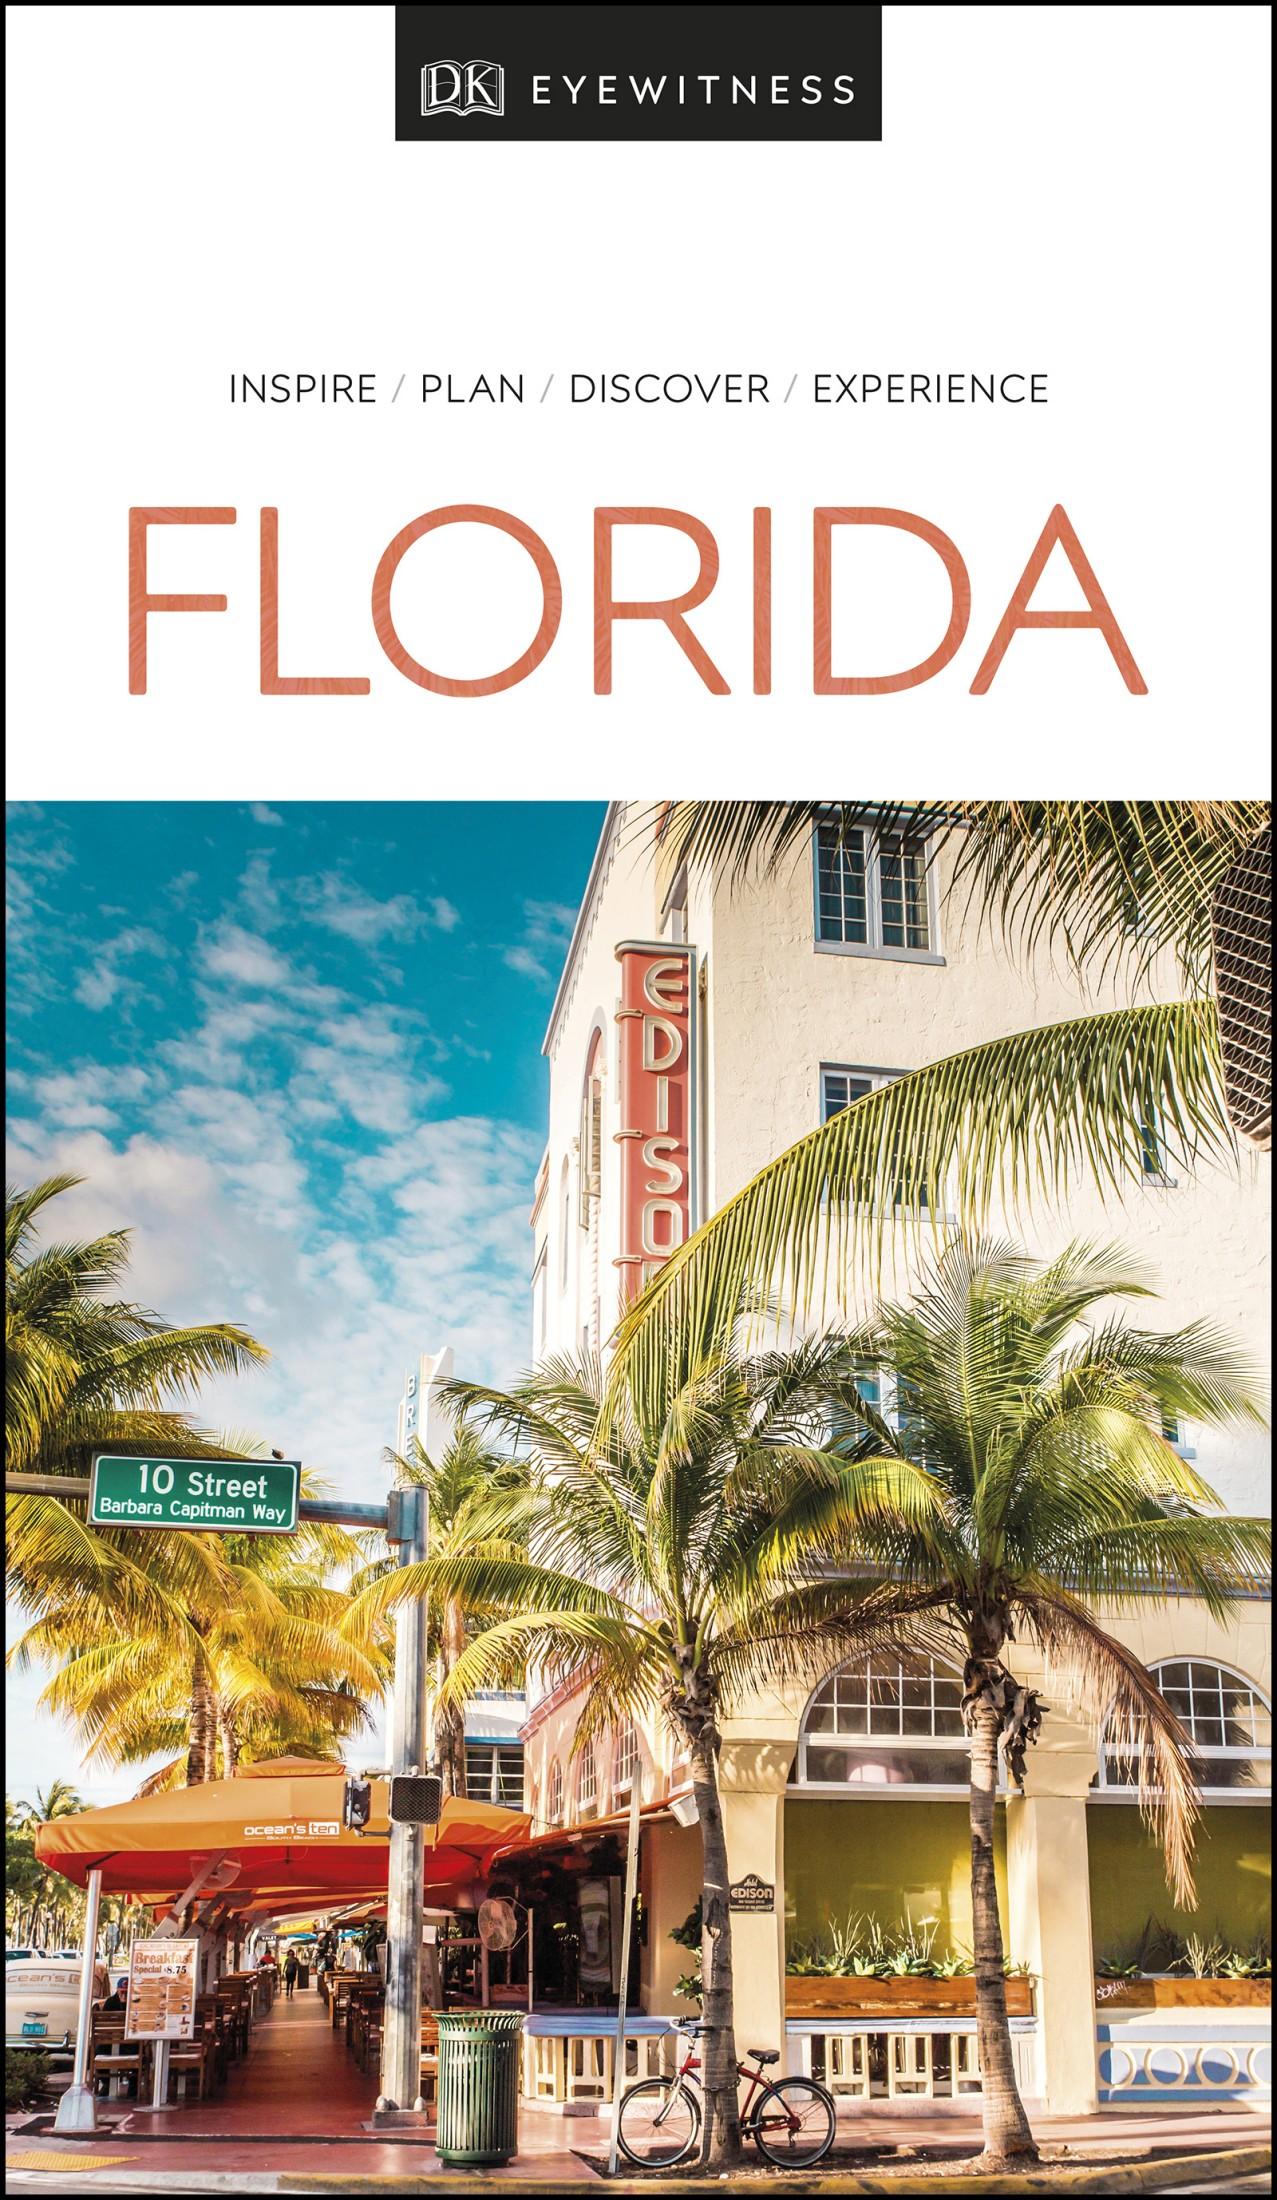 DK Eyewitness Travel Guide Florida, 2019 Edition / AvaxHome